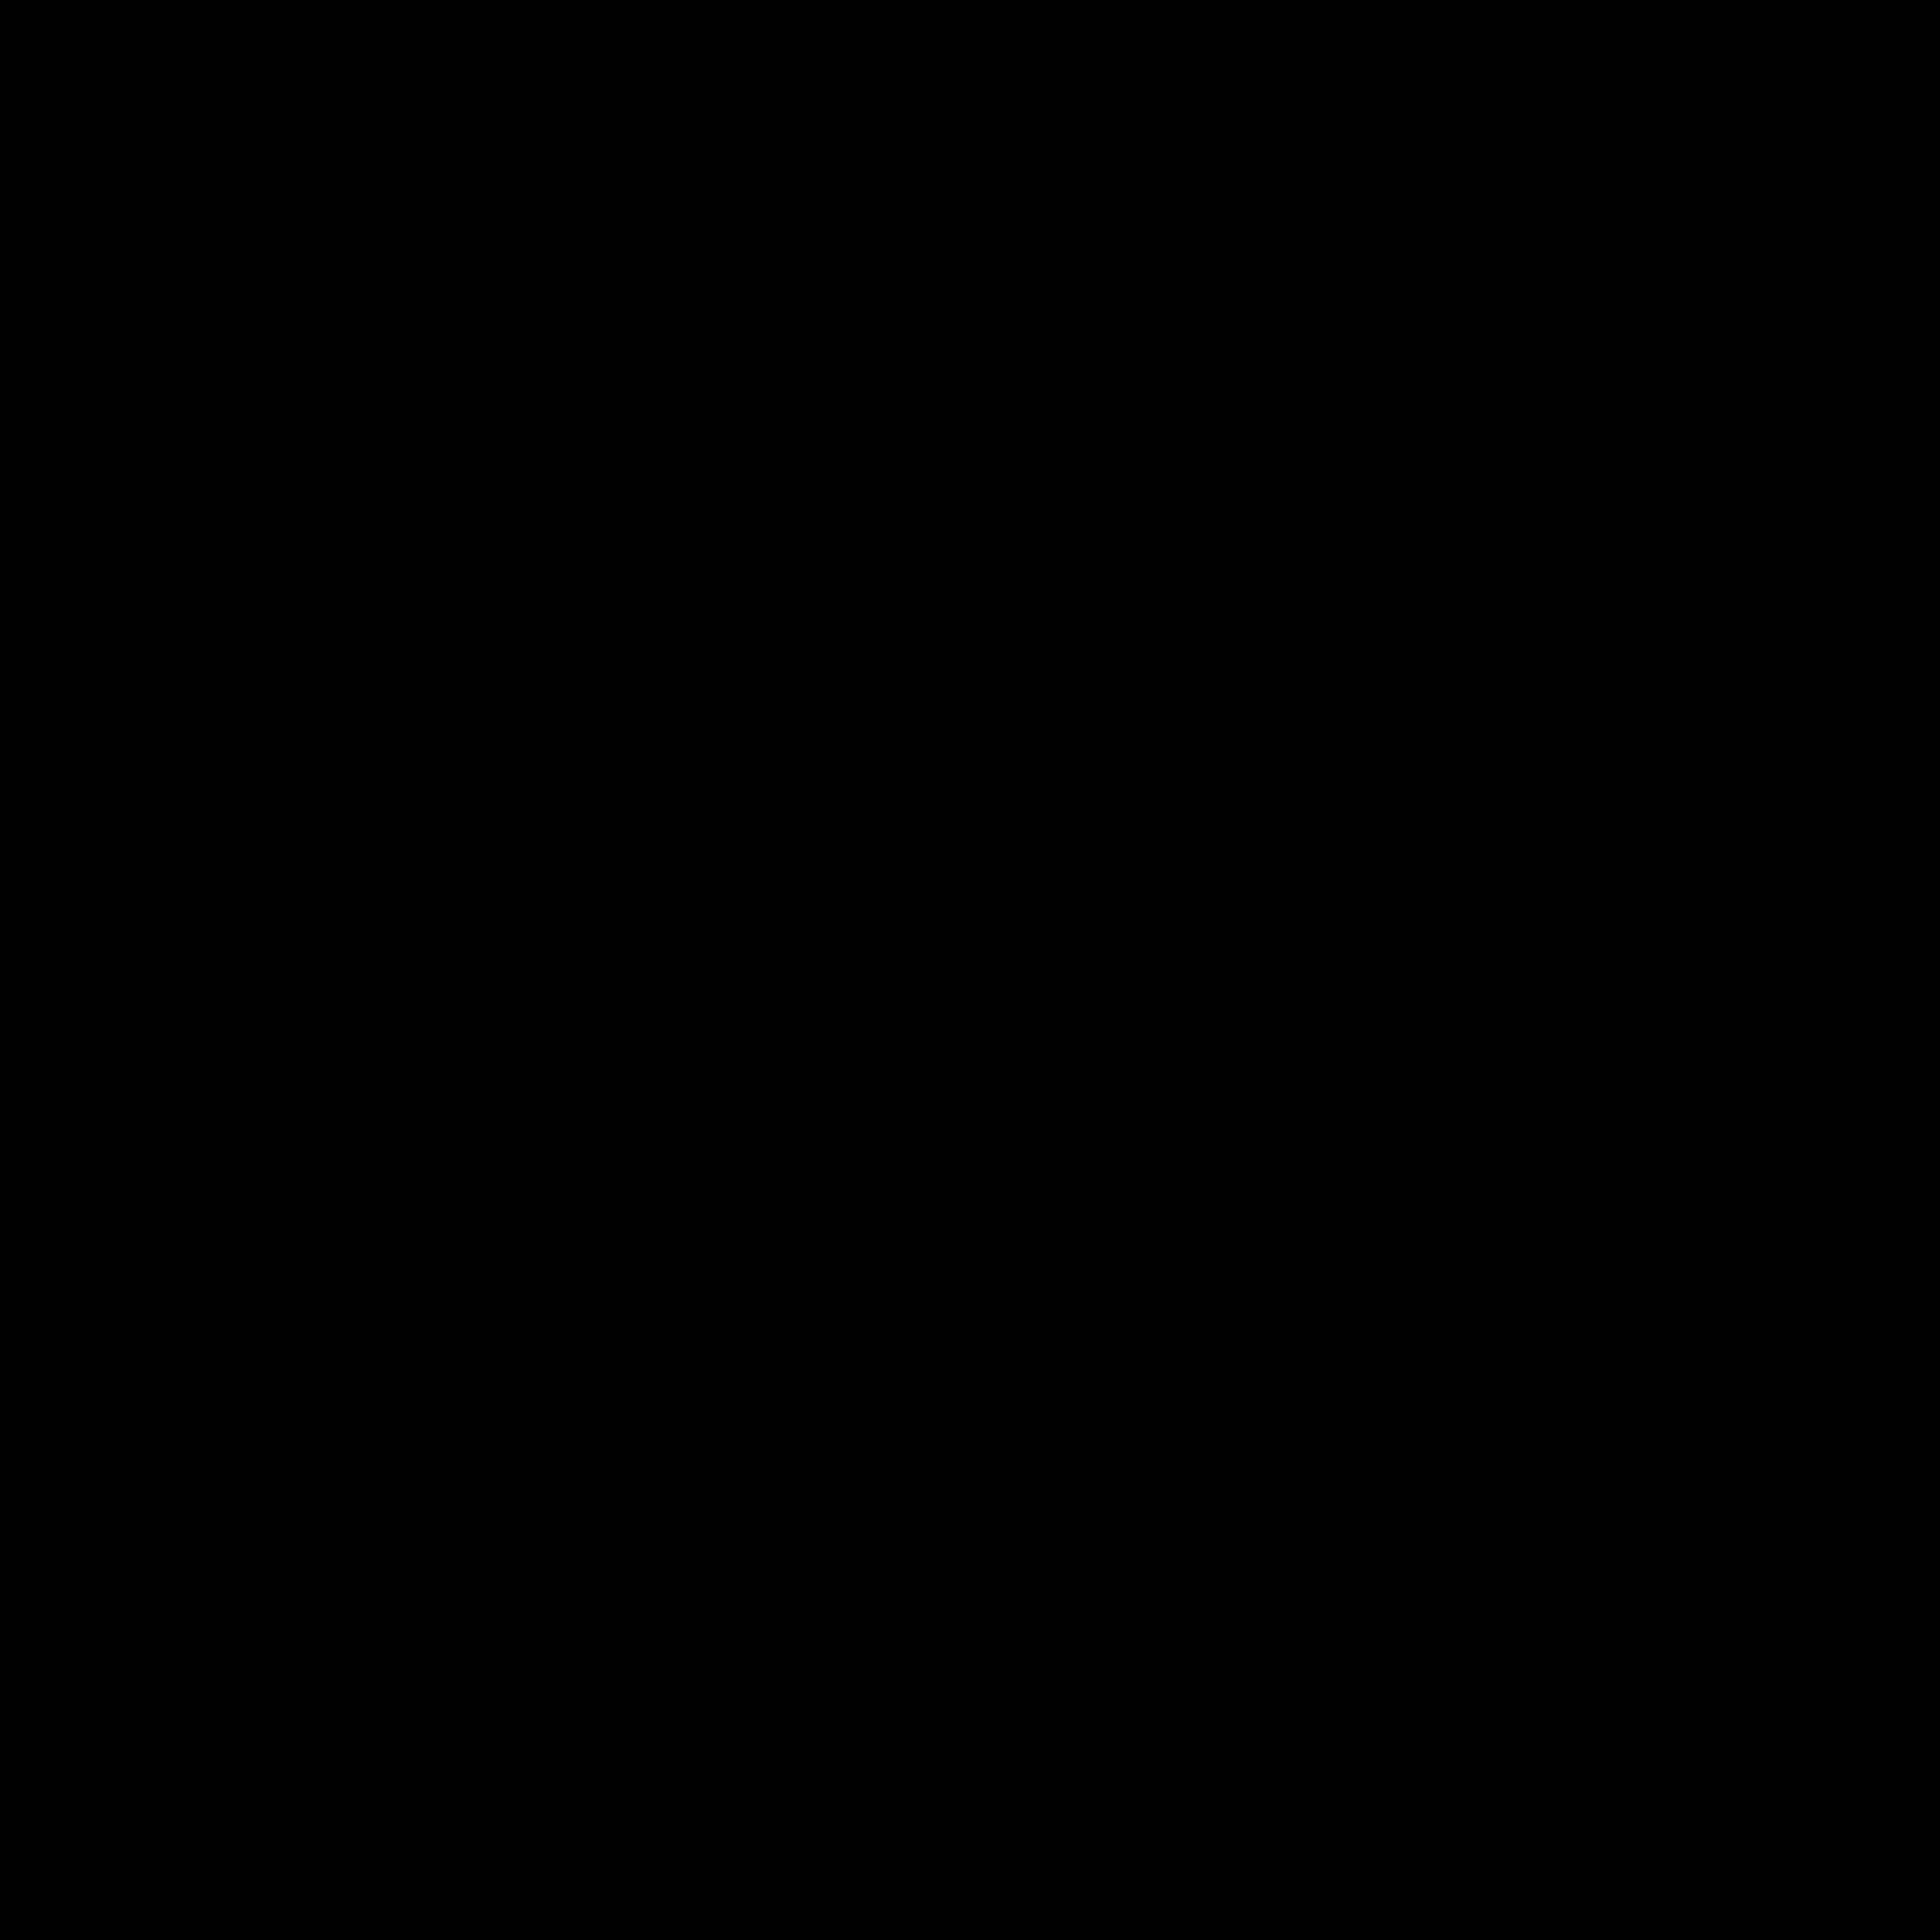 Youtube clipart plain. Outline heart symbol image